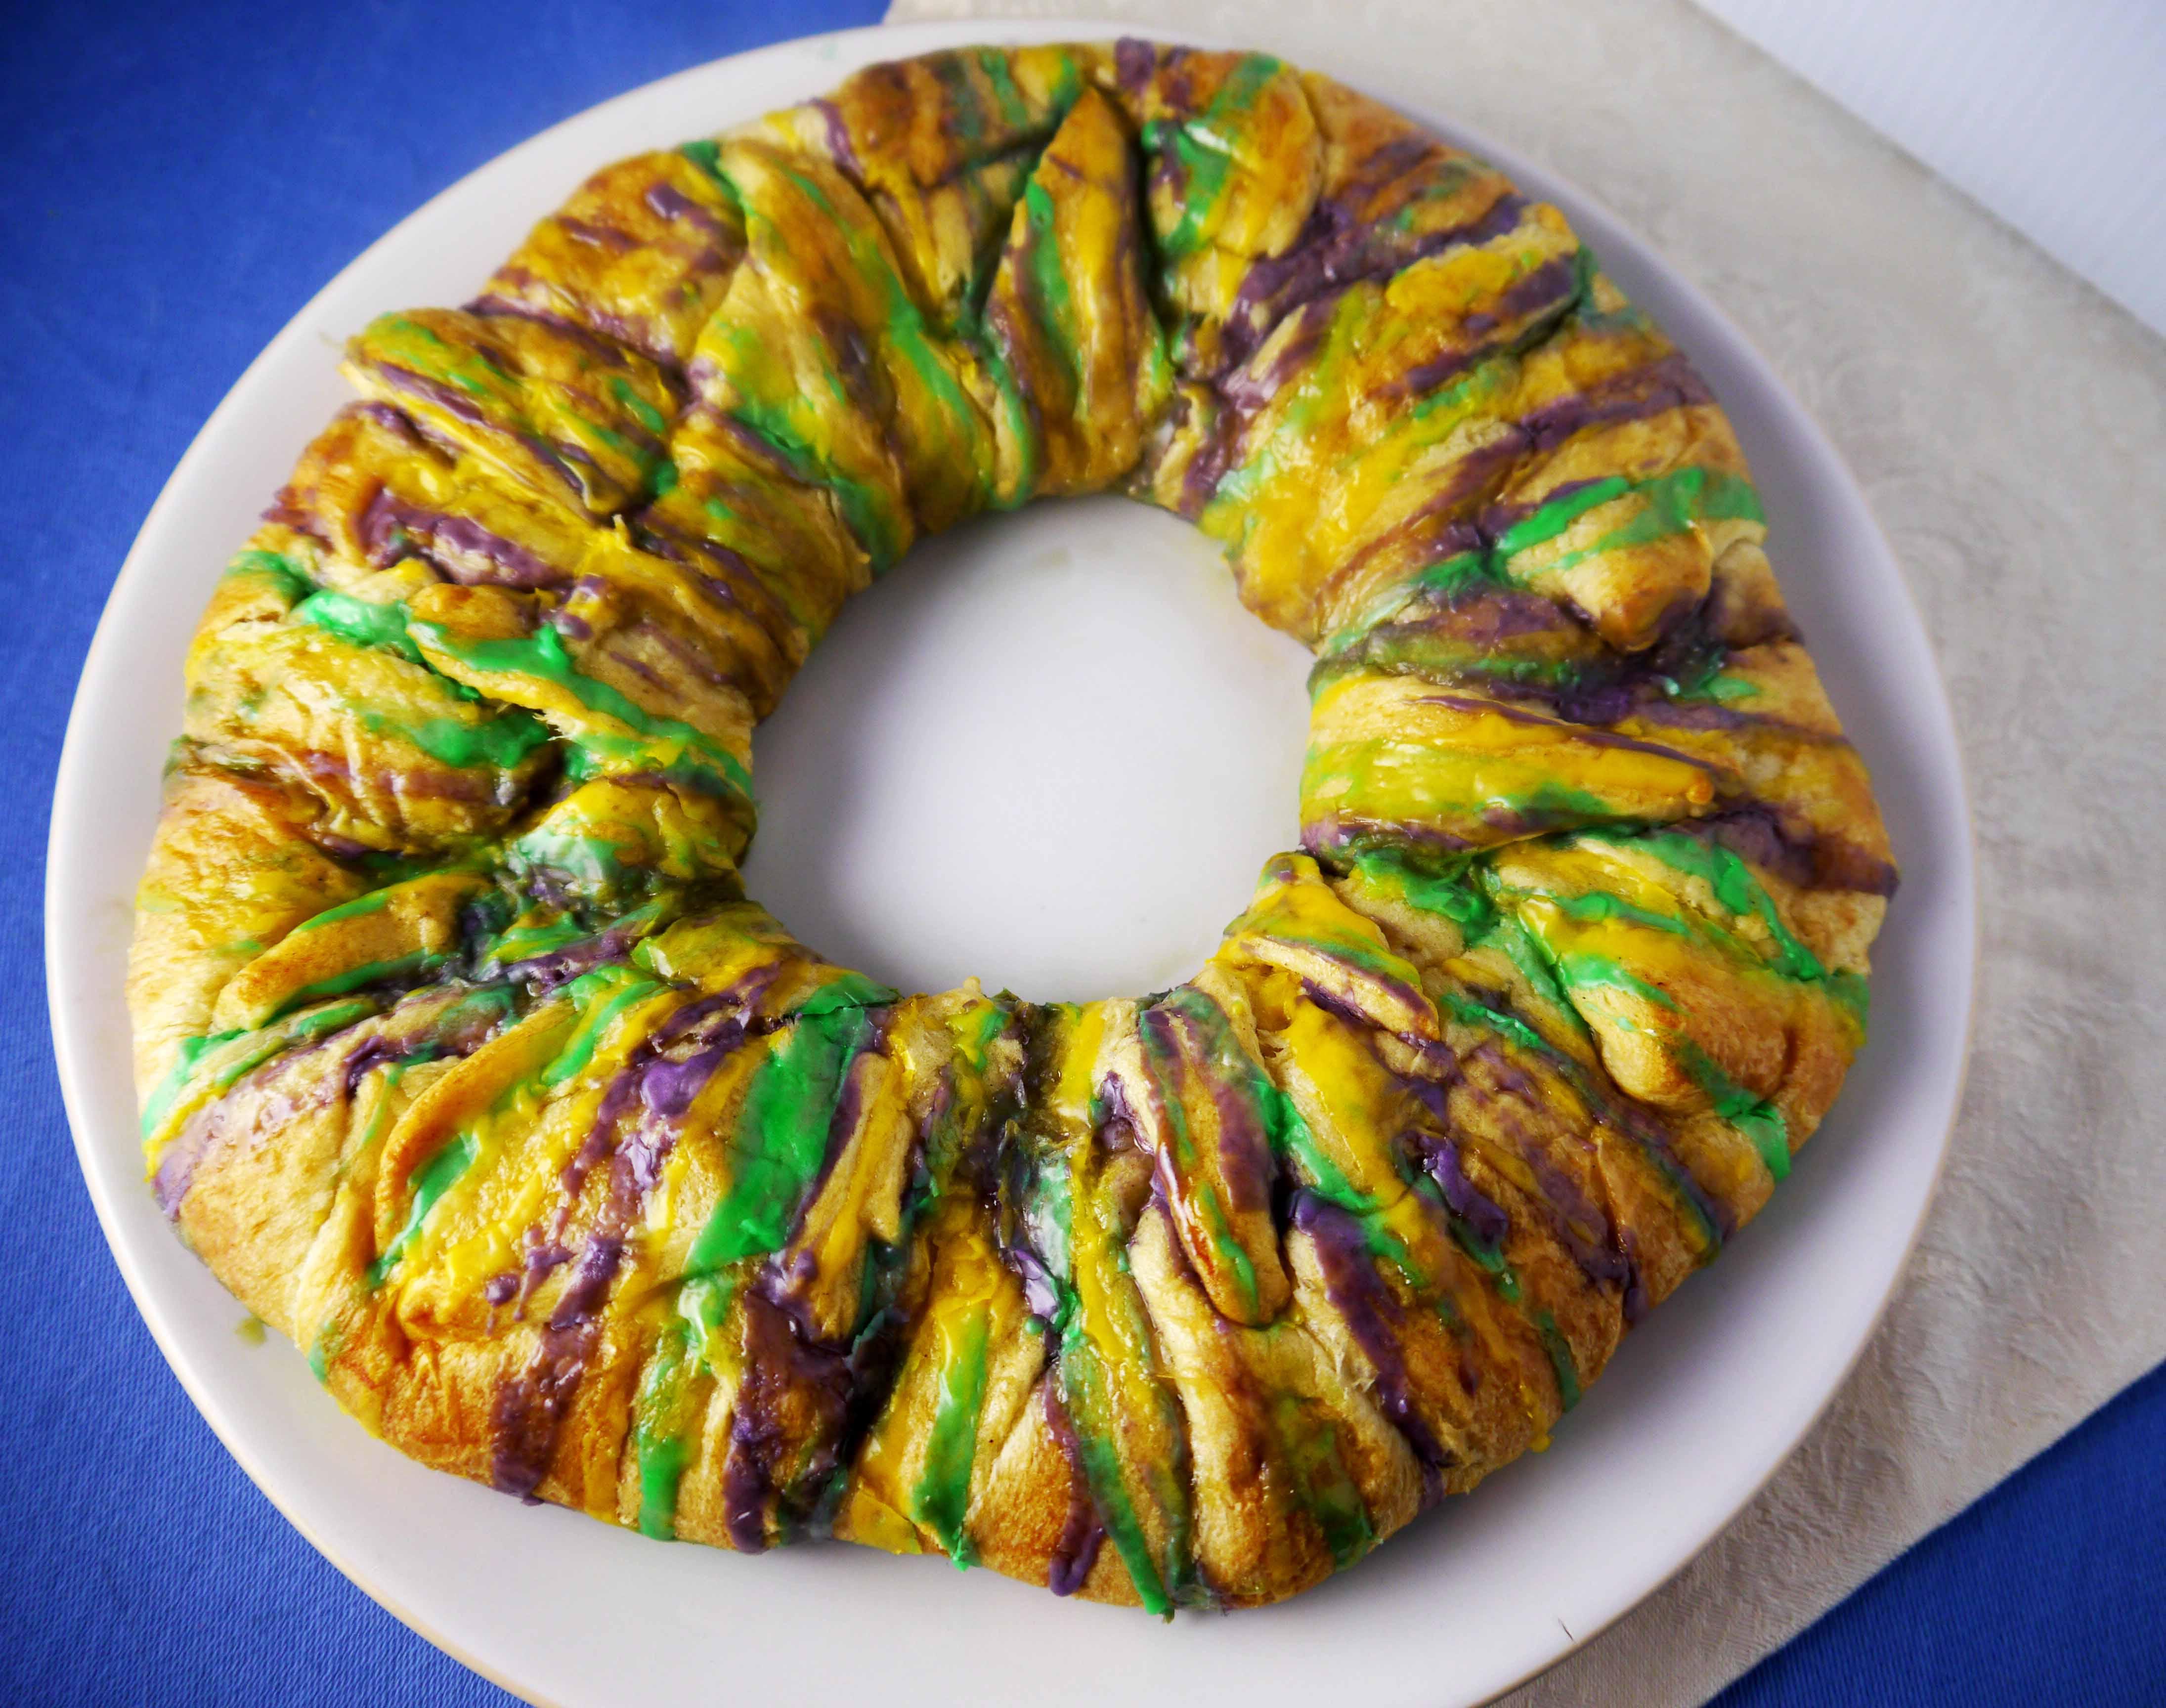 Eat This King Cake While Watching a Virtual Mardi Gras This Year